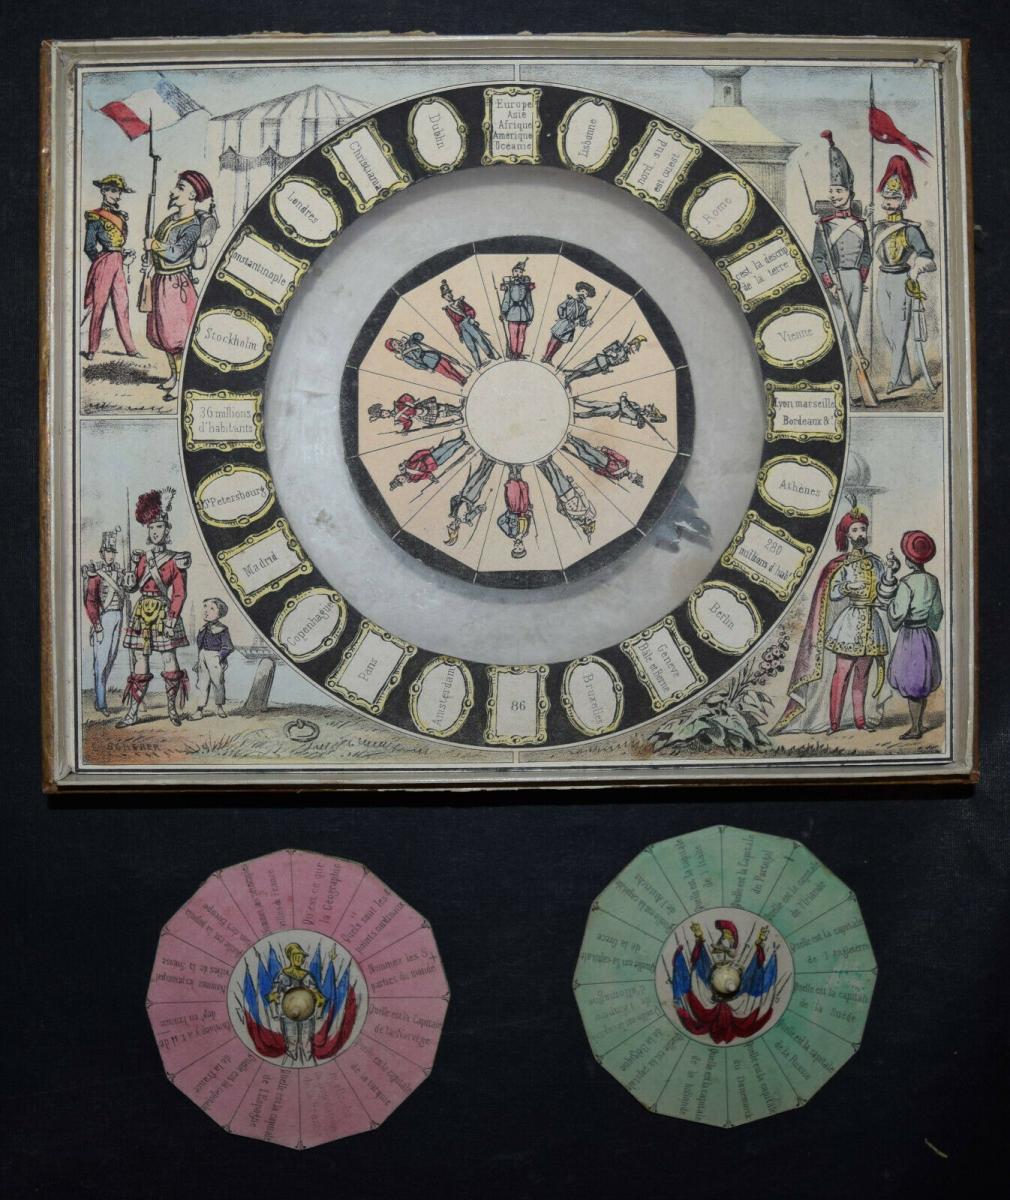 MECHANISCHES REISE-SPIEL UM 1860 SEHR SELTEN ! JEU GÉOGRAPHIQUE - GAMES - GAME 0